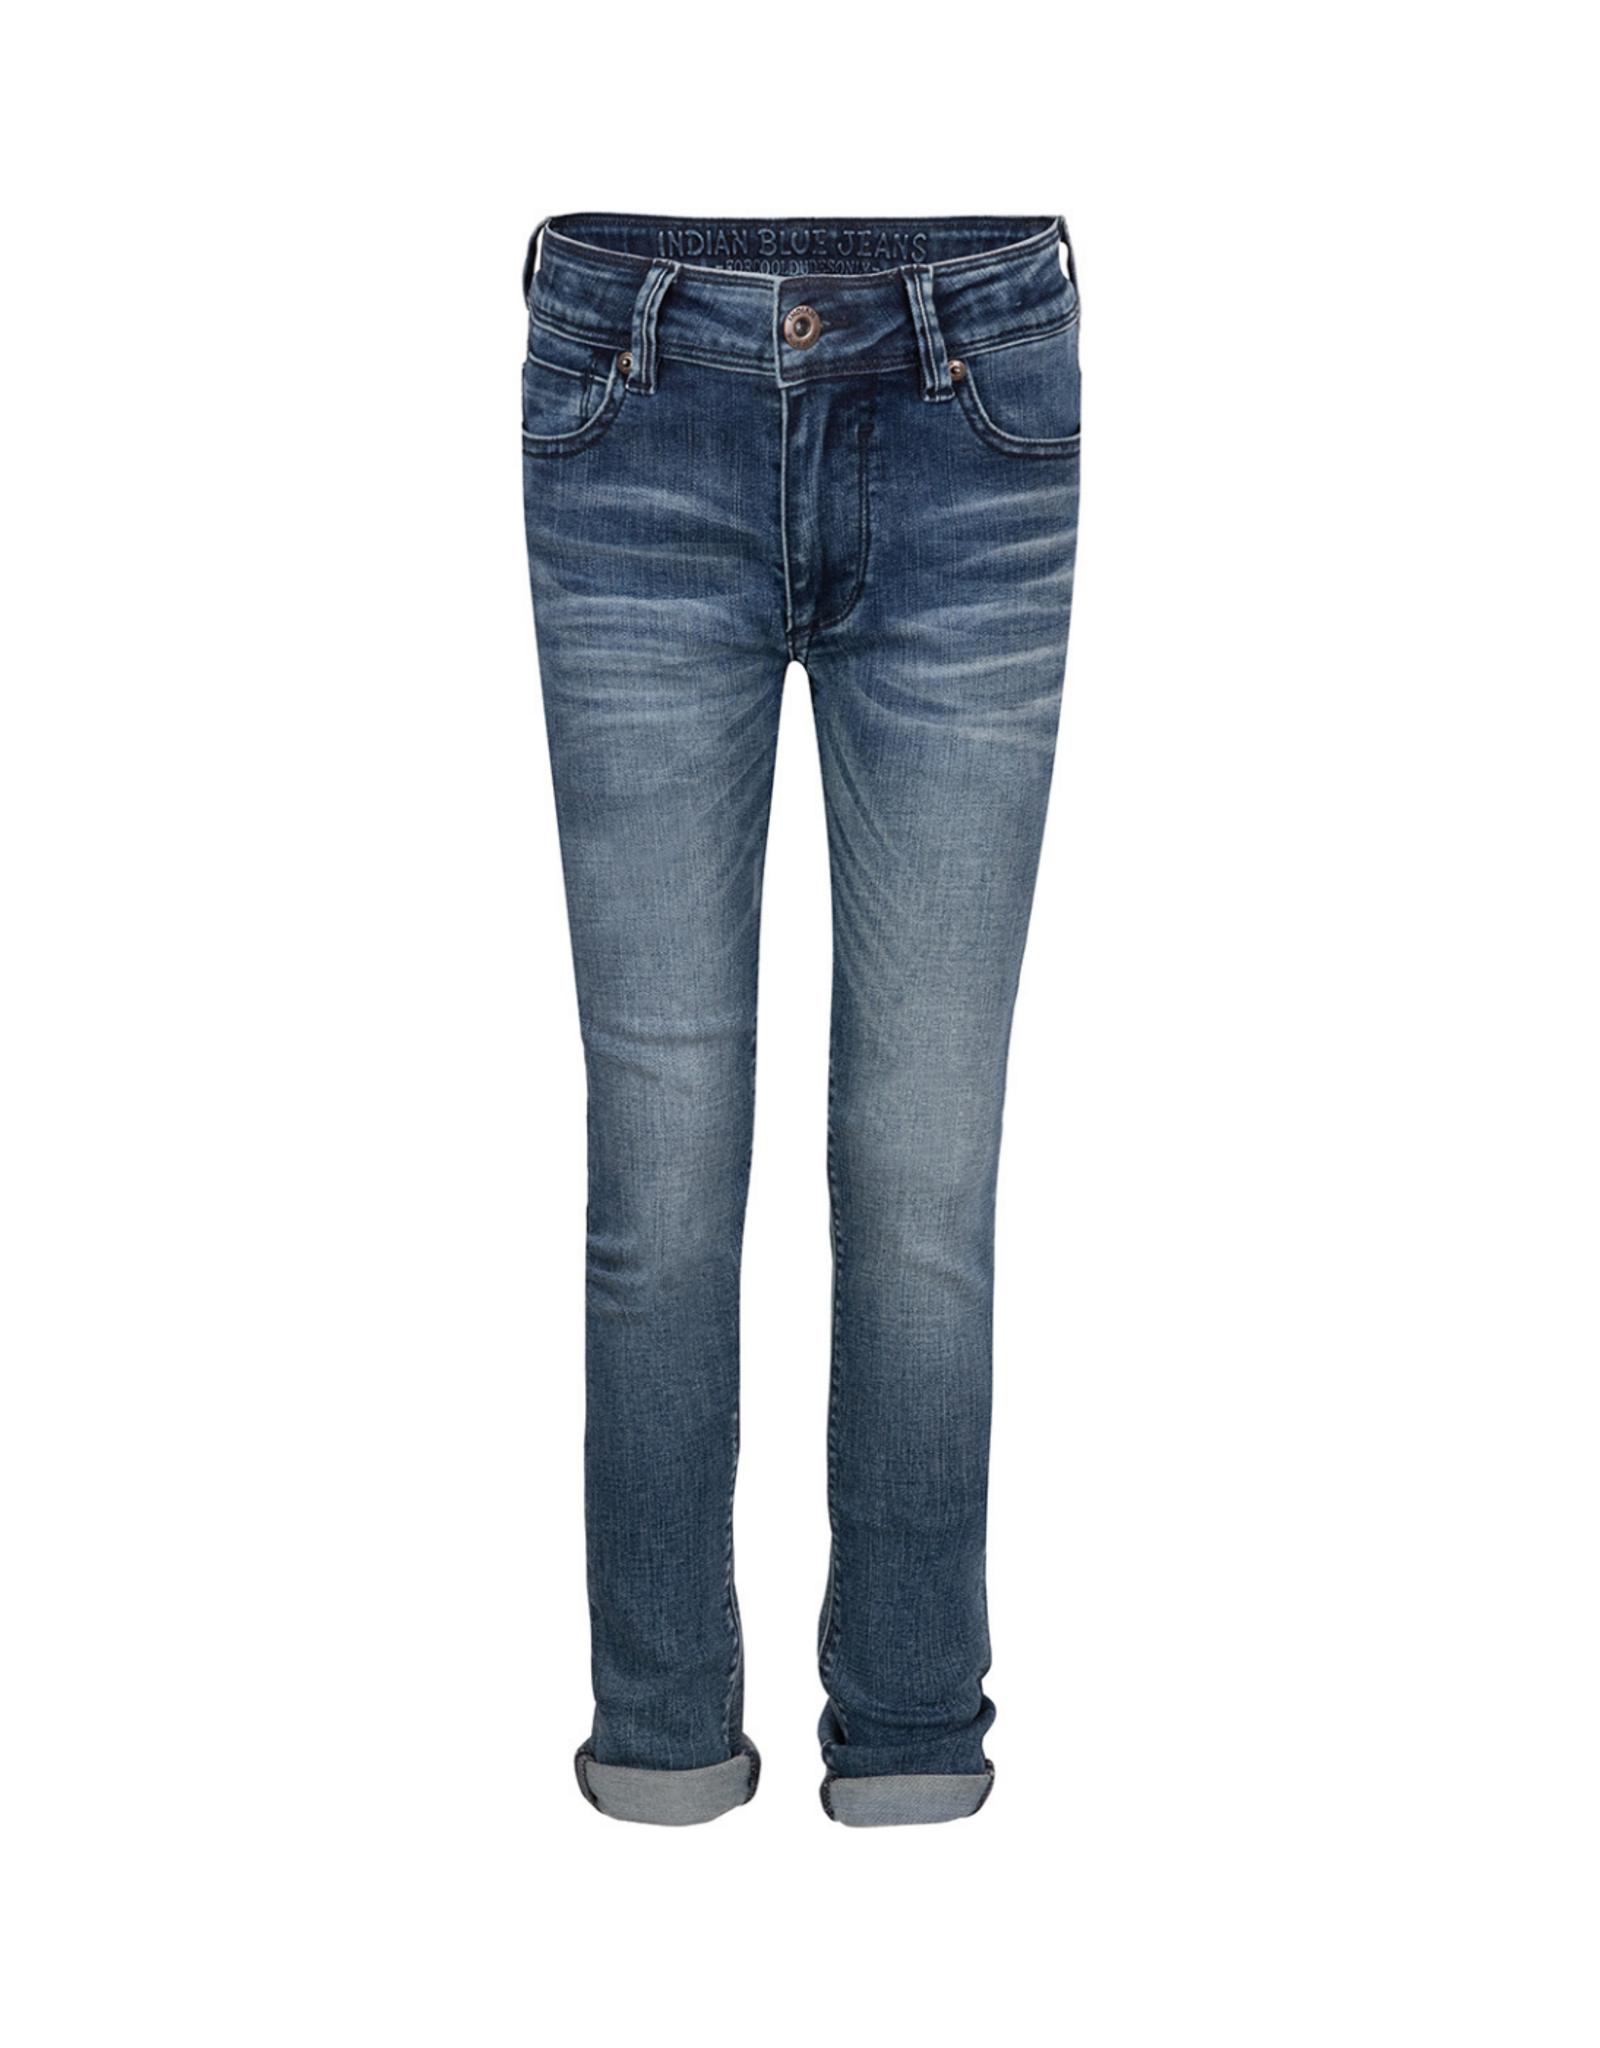 Indian Blue Jeans Indian Blue Jeans blue brad super skinny fit